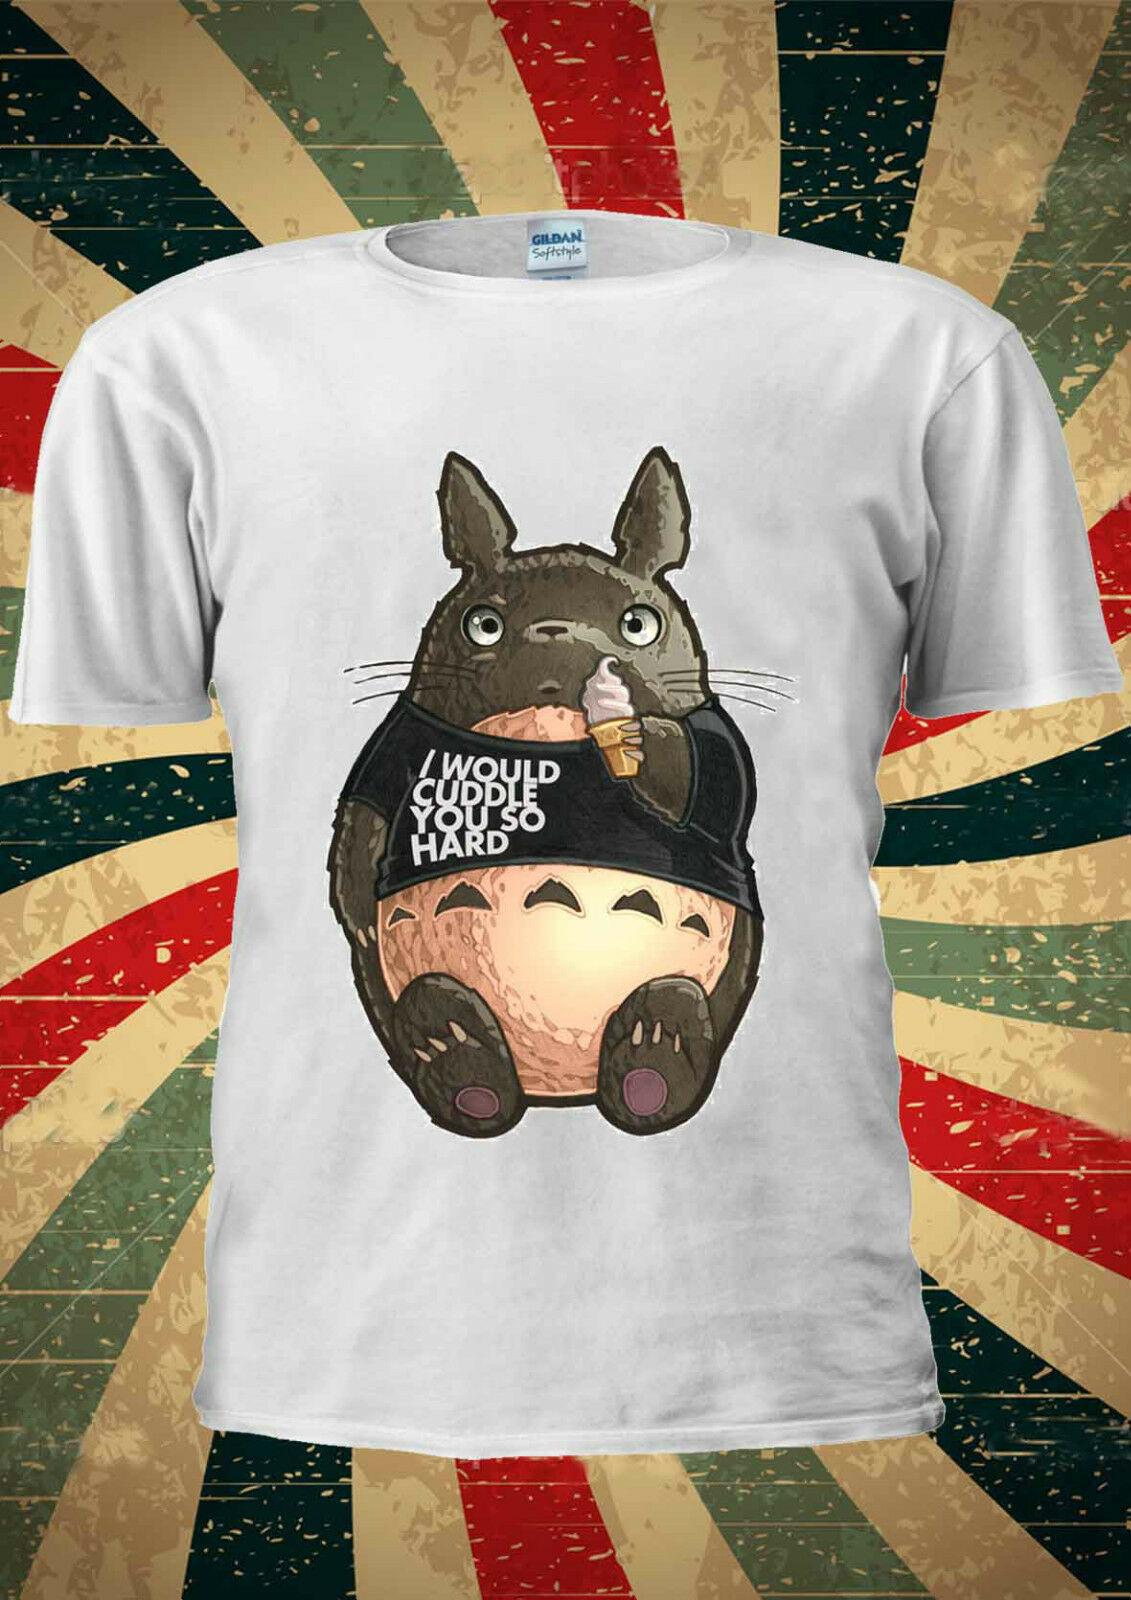 My Neighbor Totoro I Would Cuddle You So T-Shirt Vest Top Men Women Unisex 2042 Unisex Size S-3Xl